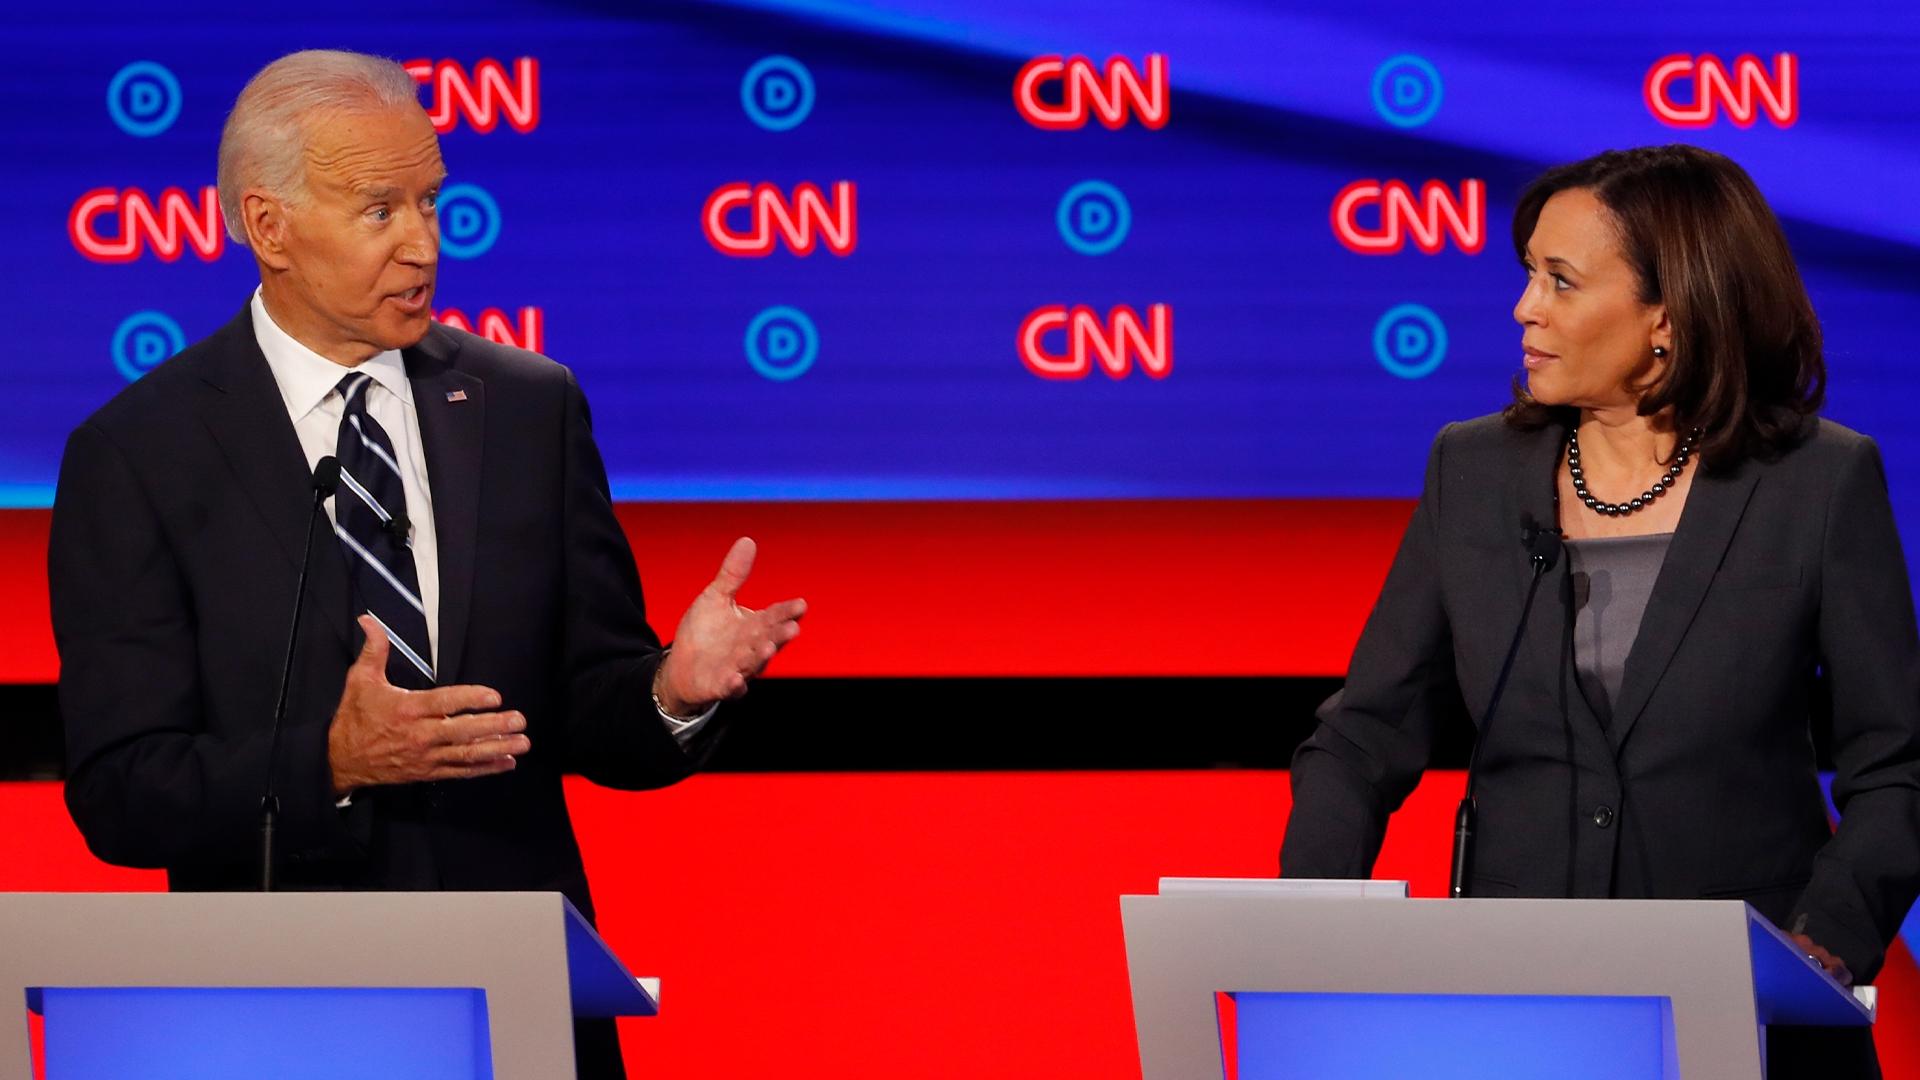 Joe Biden Chooses Kamala Harris as his Running Mate in the 2020 Presidential Election